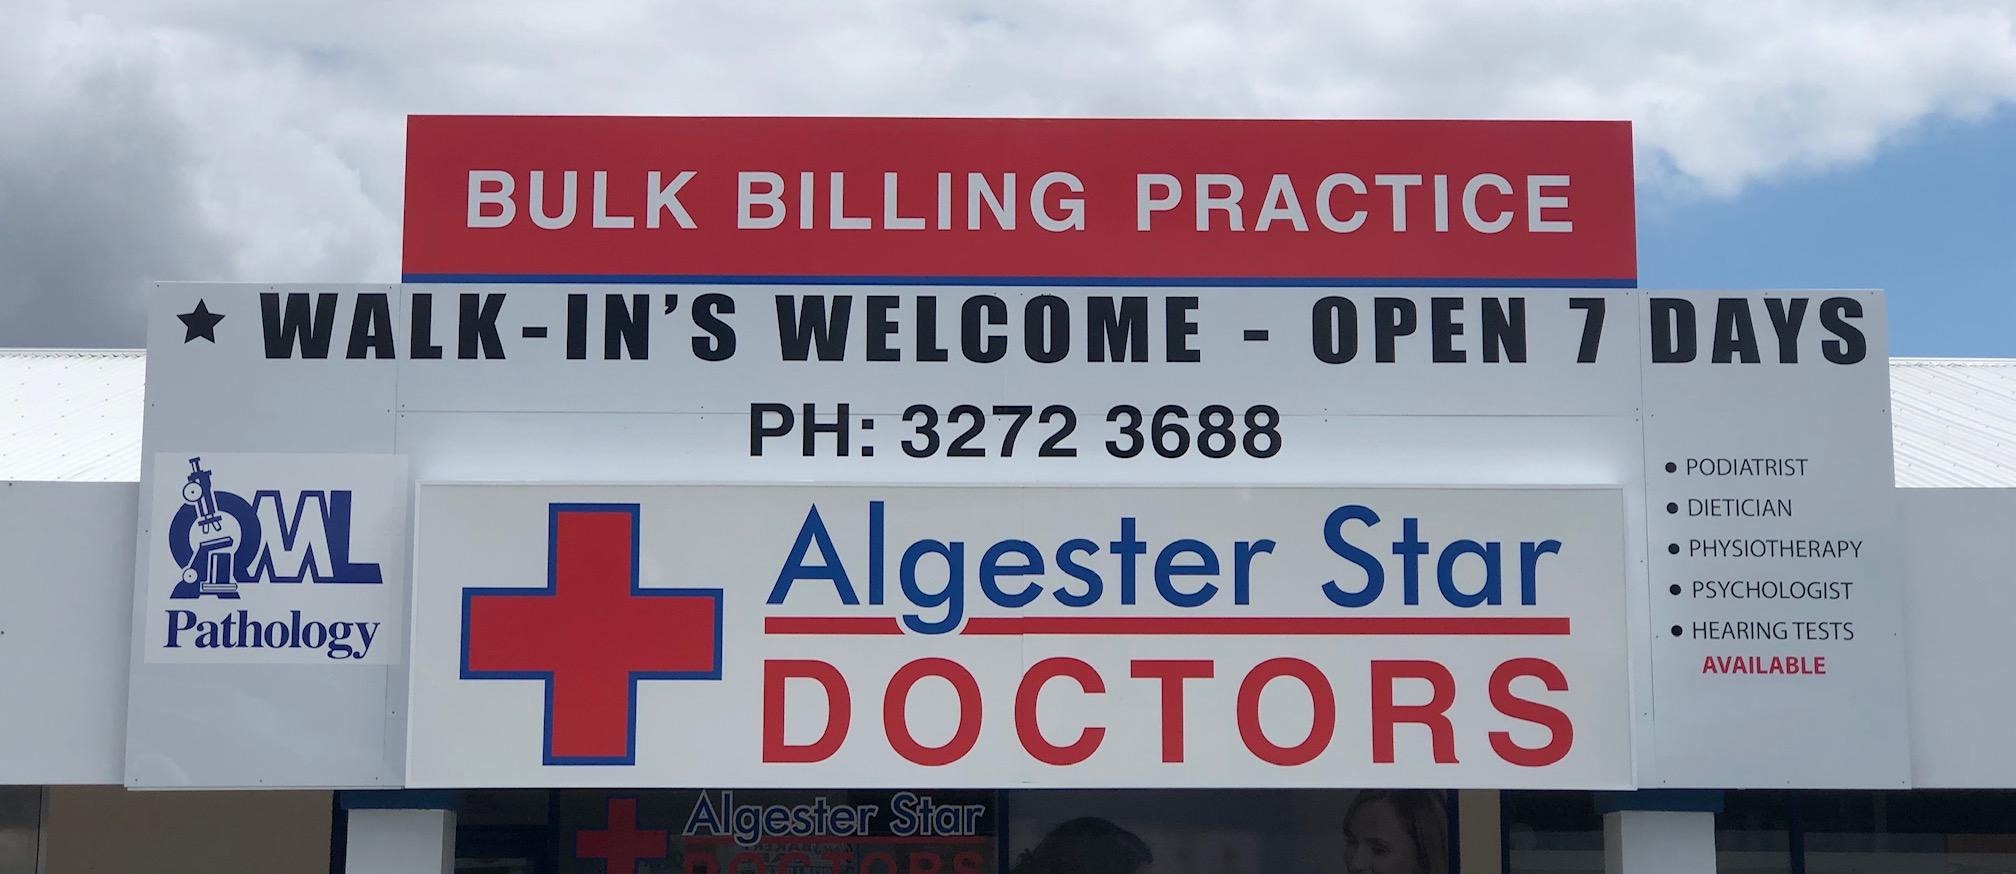 Bulk Billing Practice – Algester Star Doctors – Bulk Billing Practice